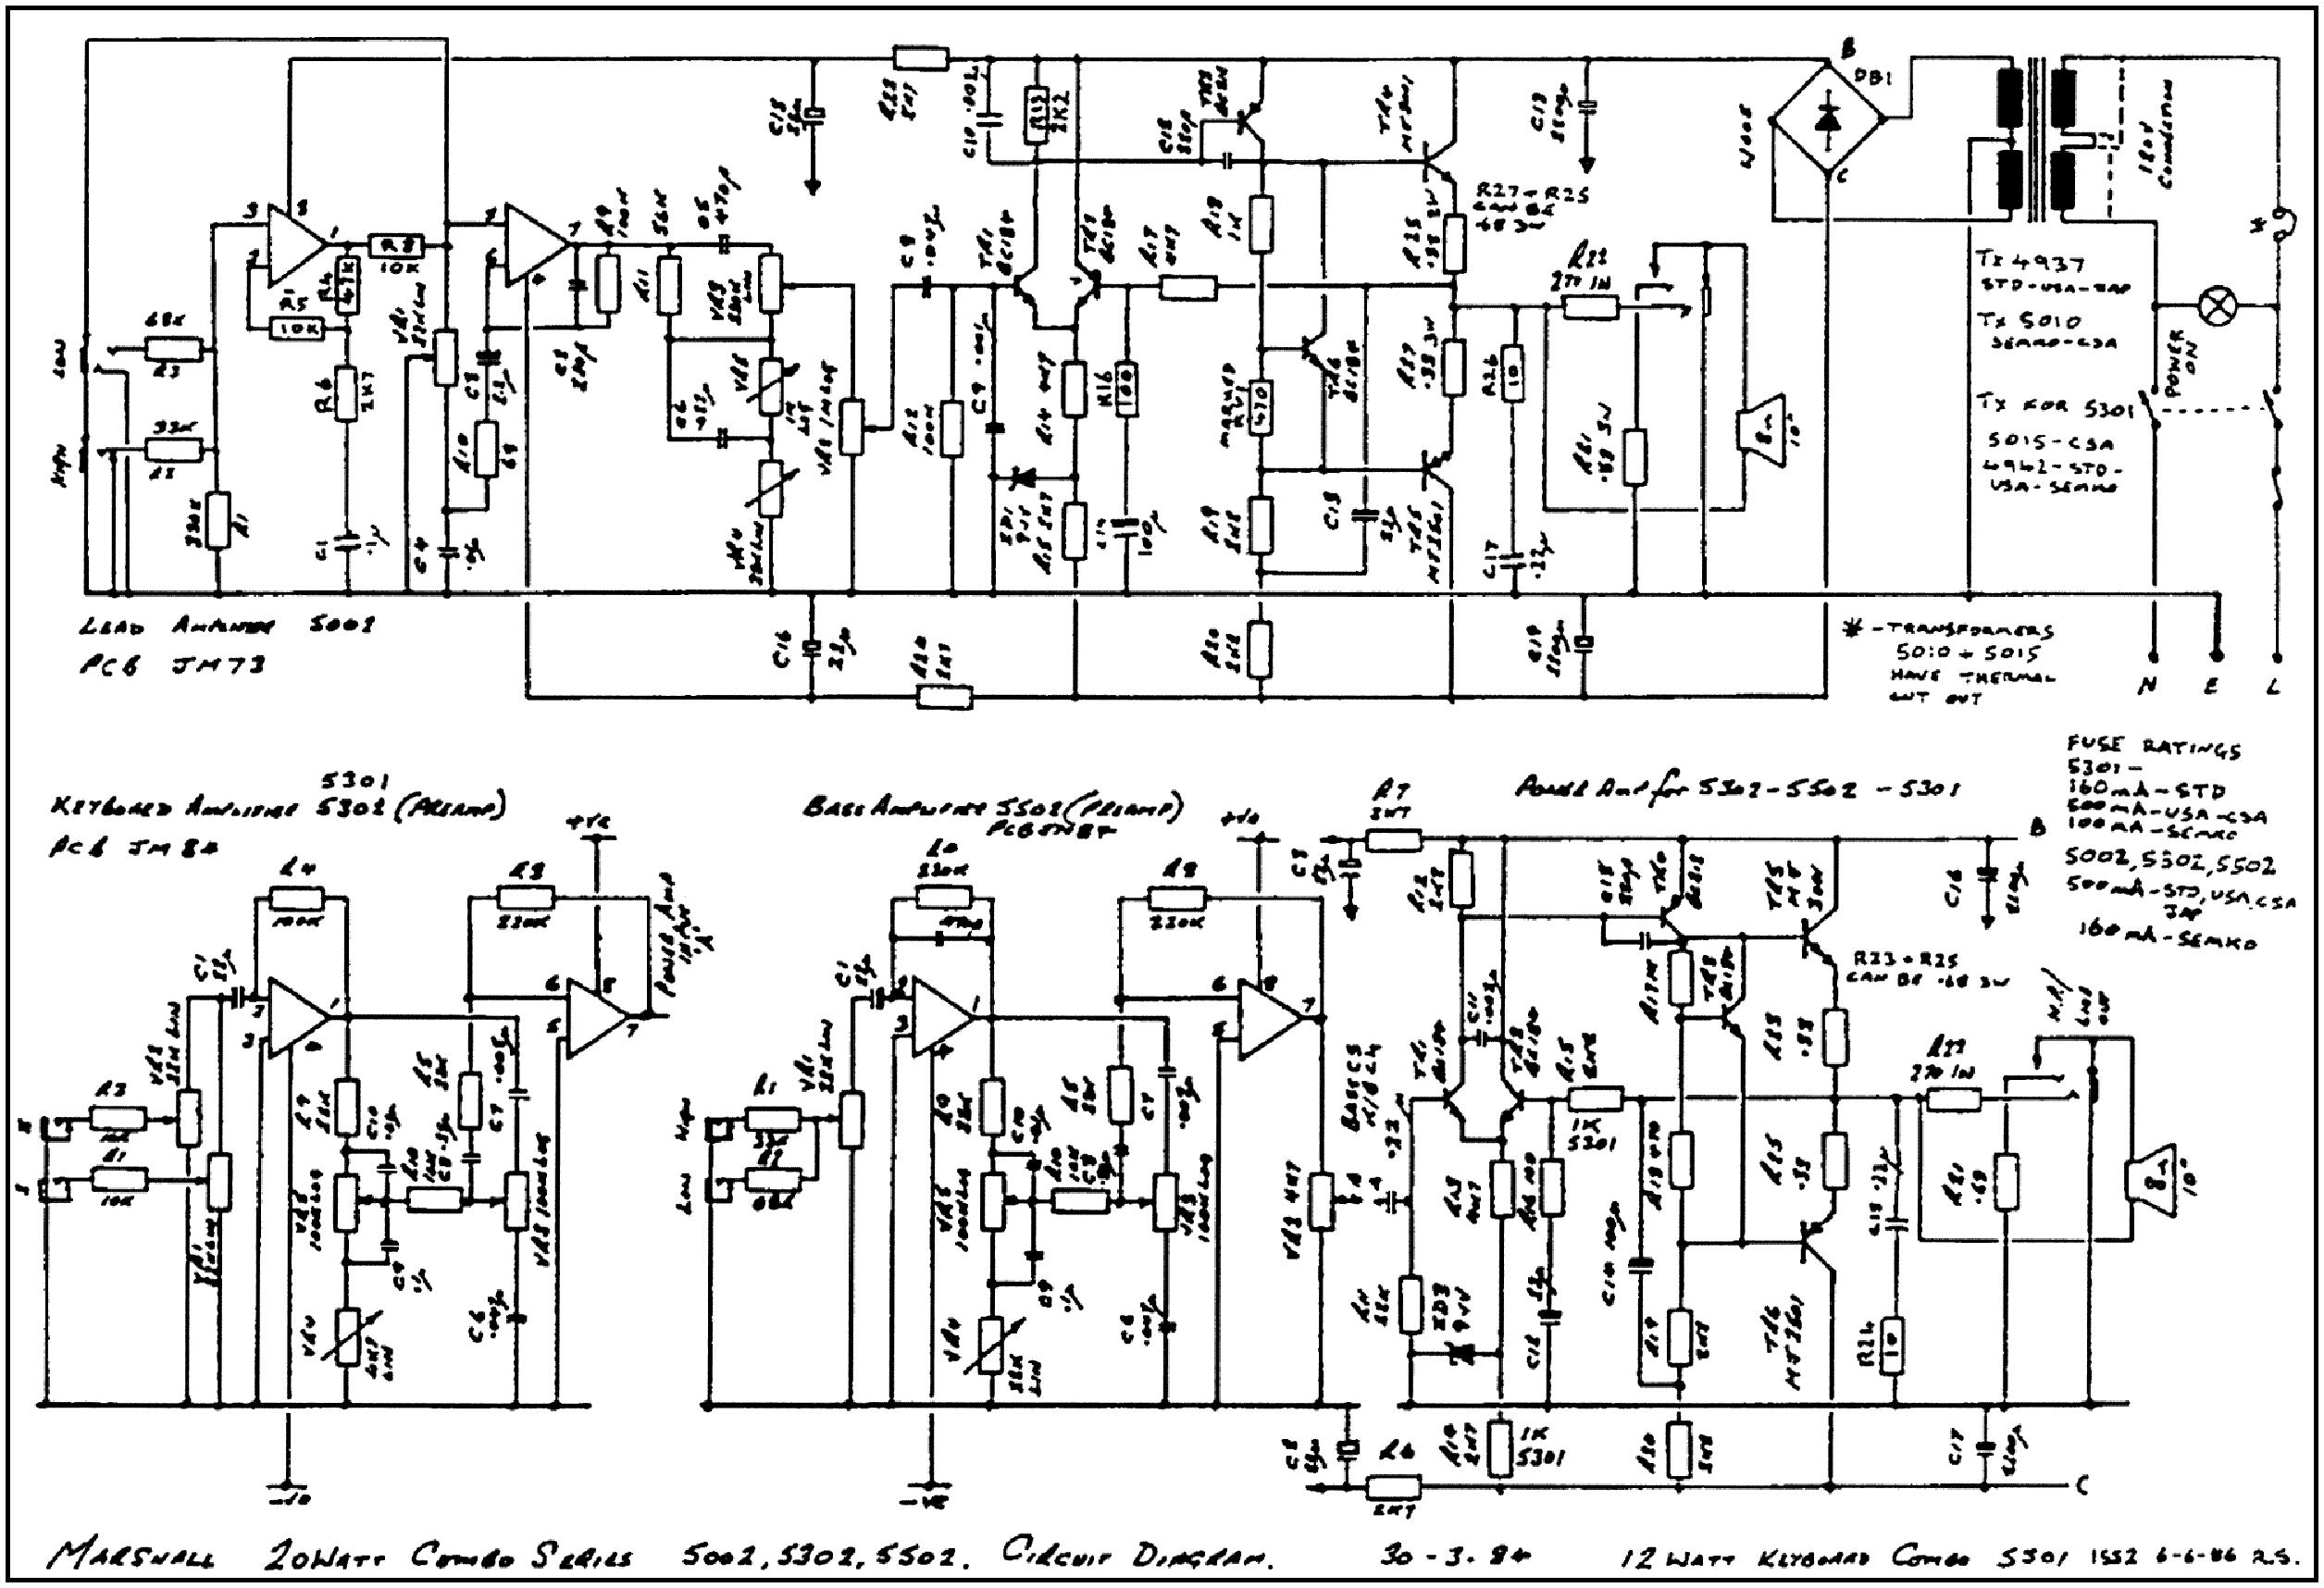 on marshall avt 2000 wiring diagram